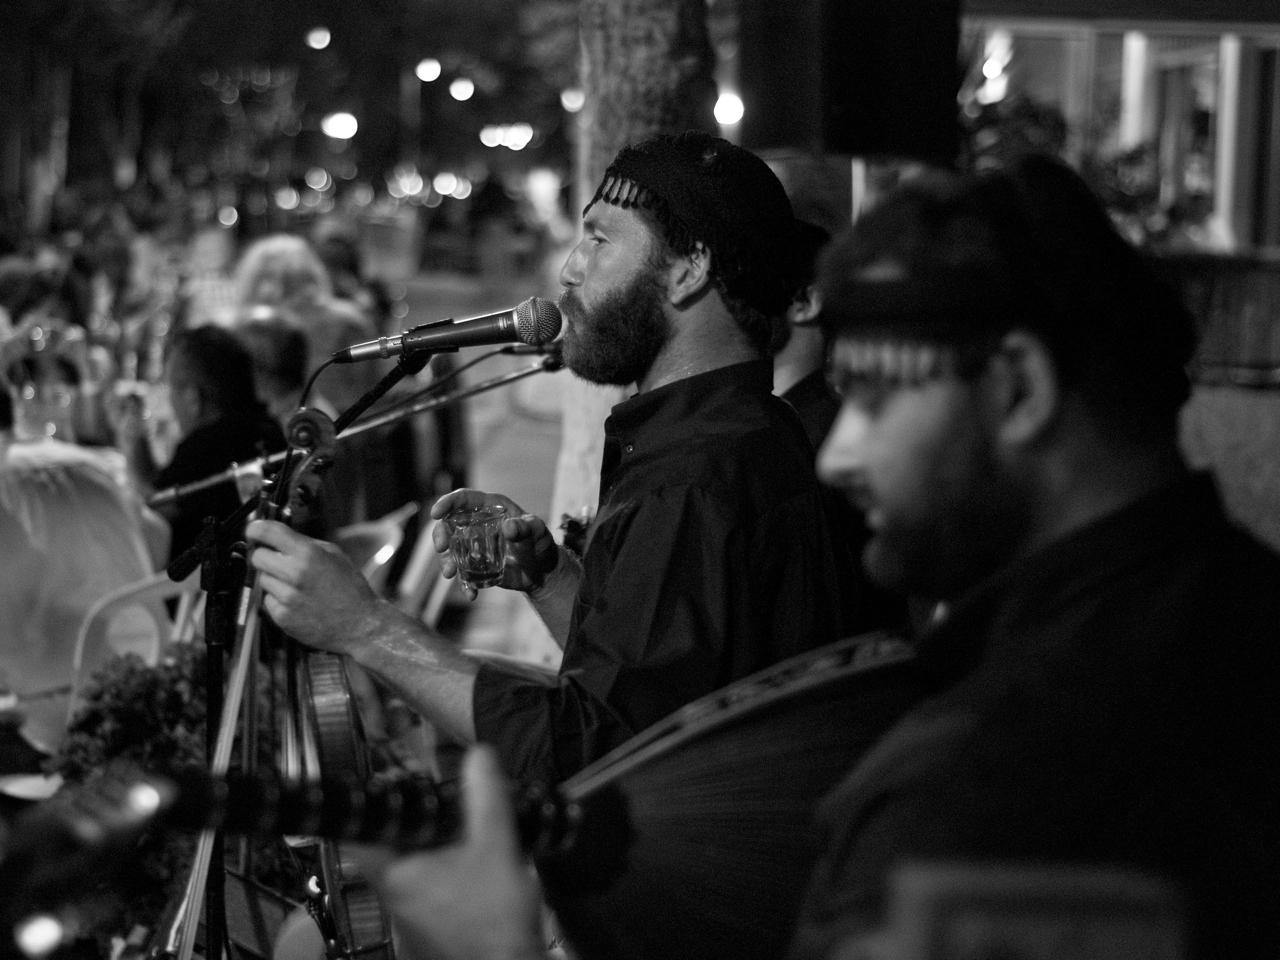 cretan fiesta, cretan music, musicians of Crete, car rental, car hire